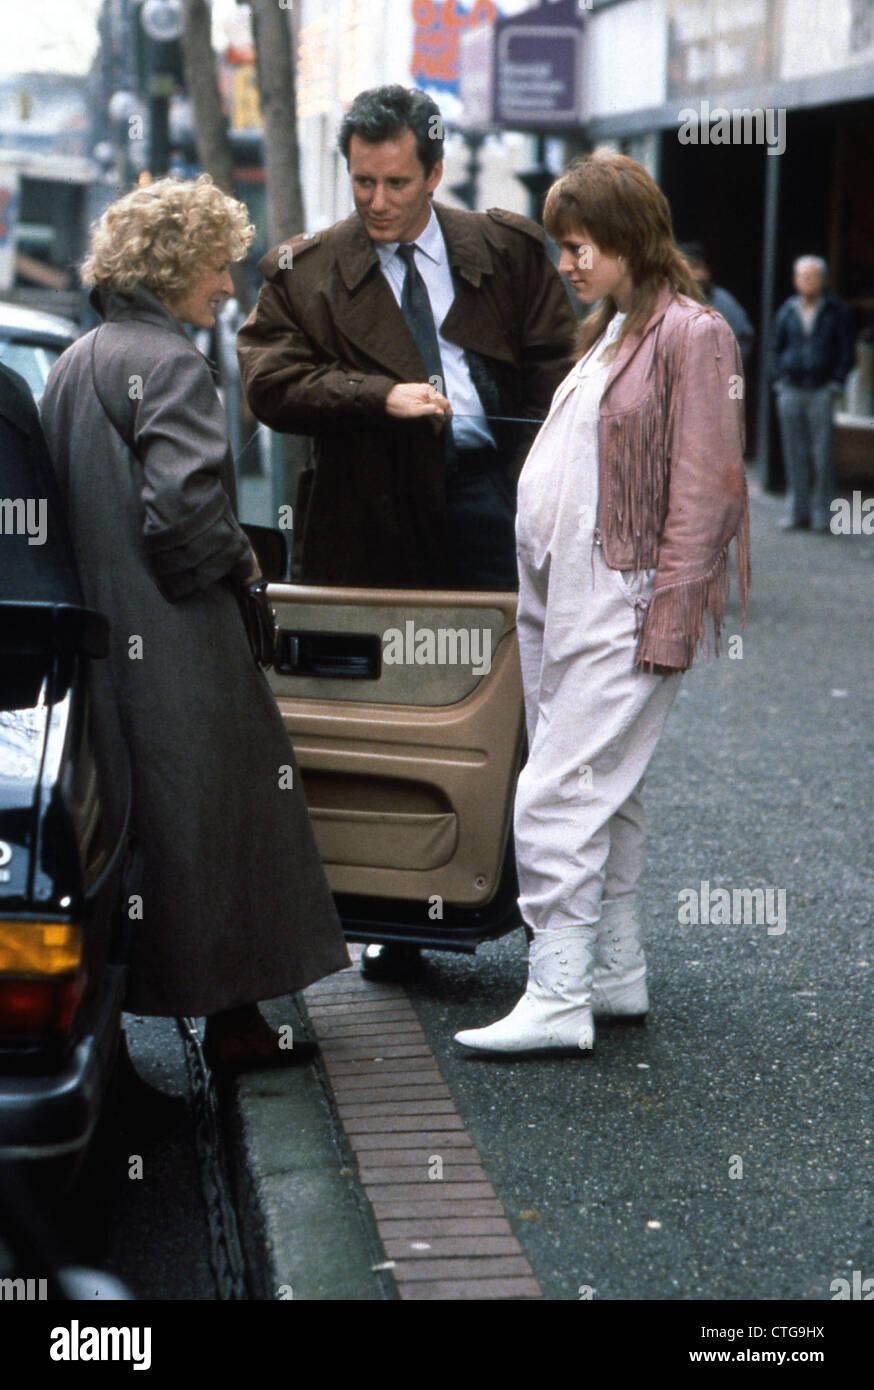 IMMEDIATE FAMILY (1989) GLENN CLOSE, JAMES WOODS, MARY STUART MASTERSON JONATHAN KAPLAN (DIR) 003 MOVIESTORE COLLECTION Stock Photo